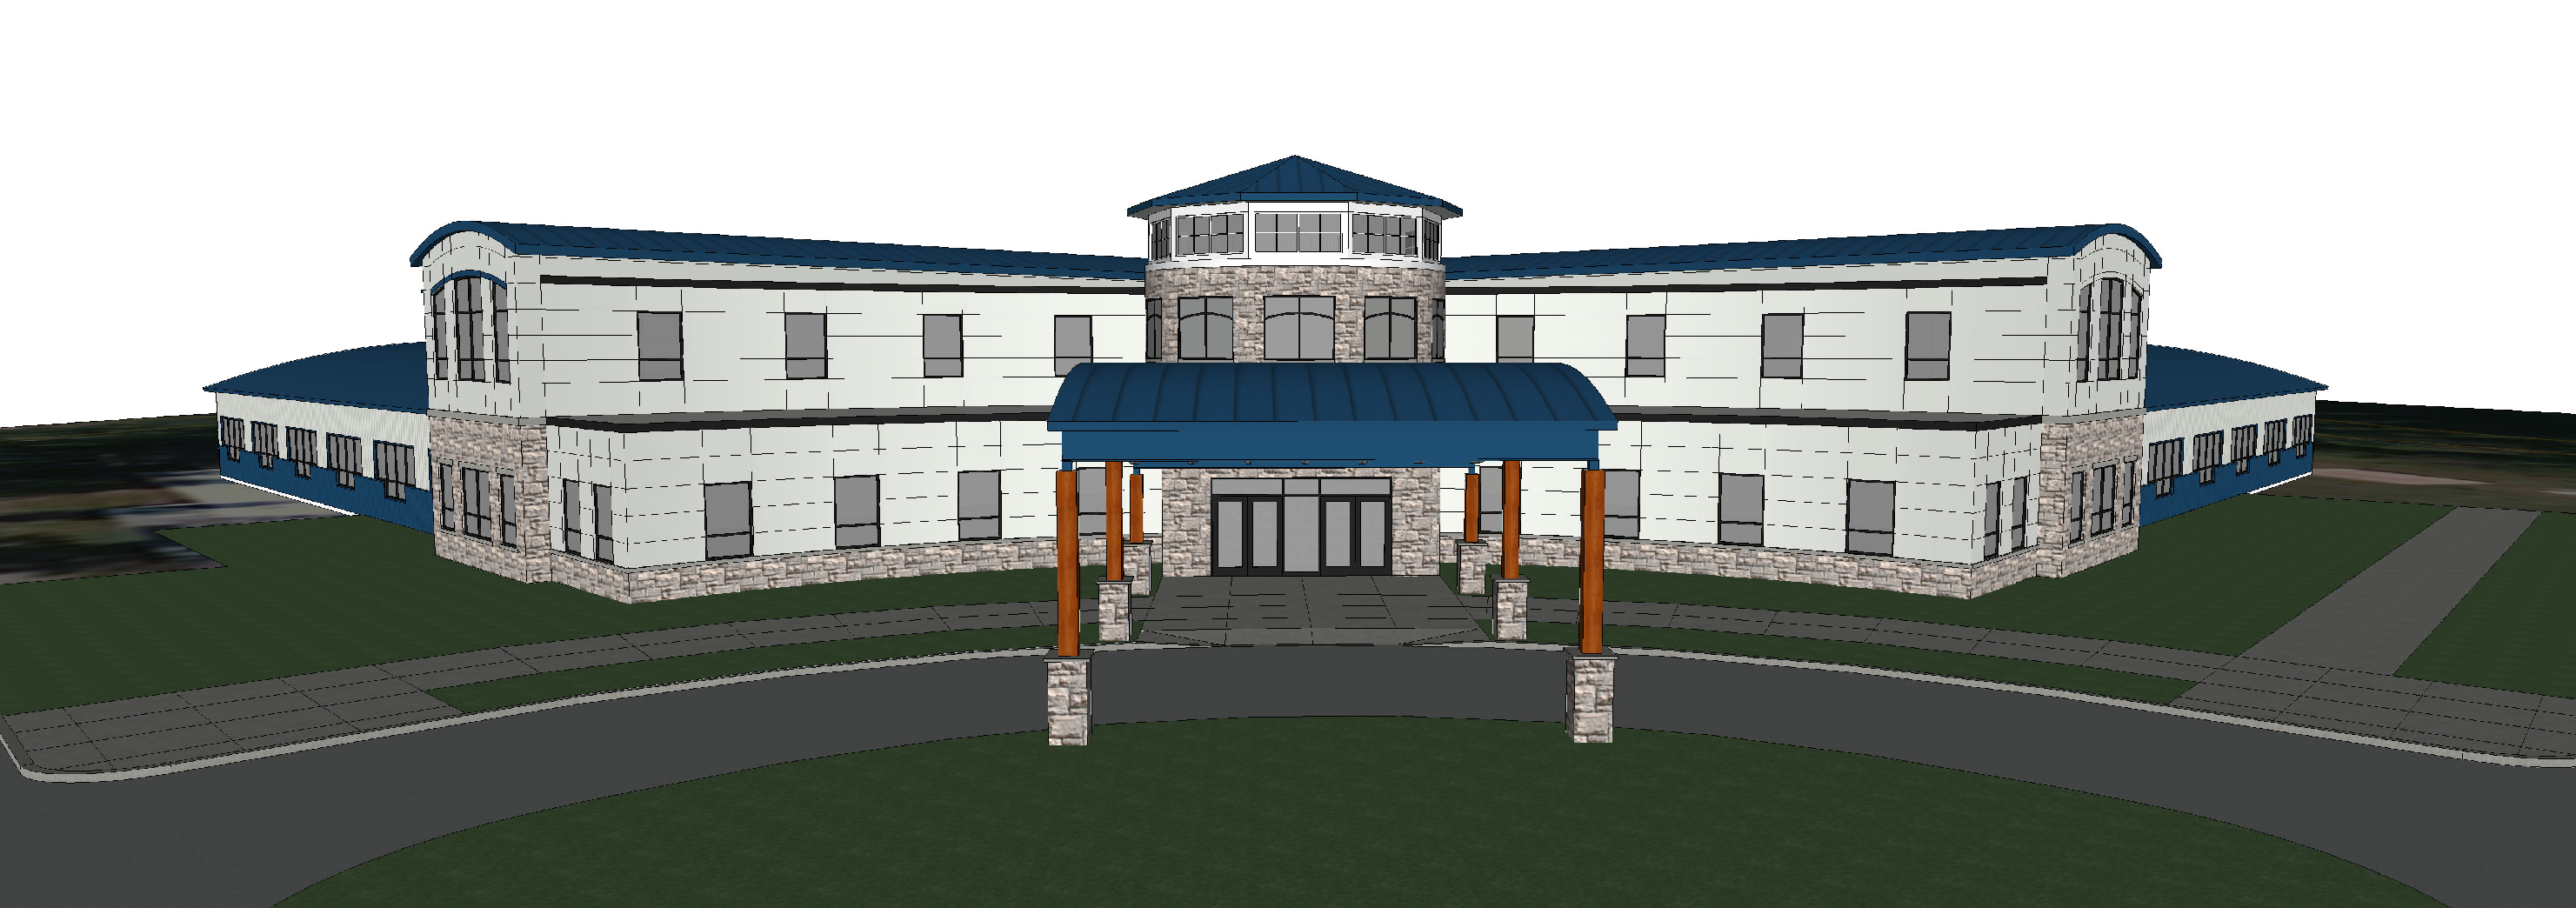 concept drawing of future hydro aquatic center